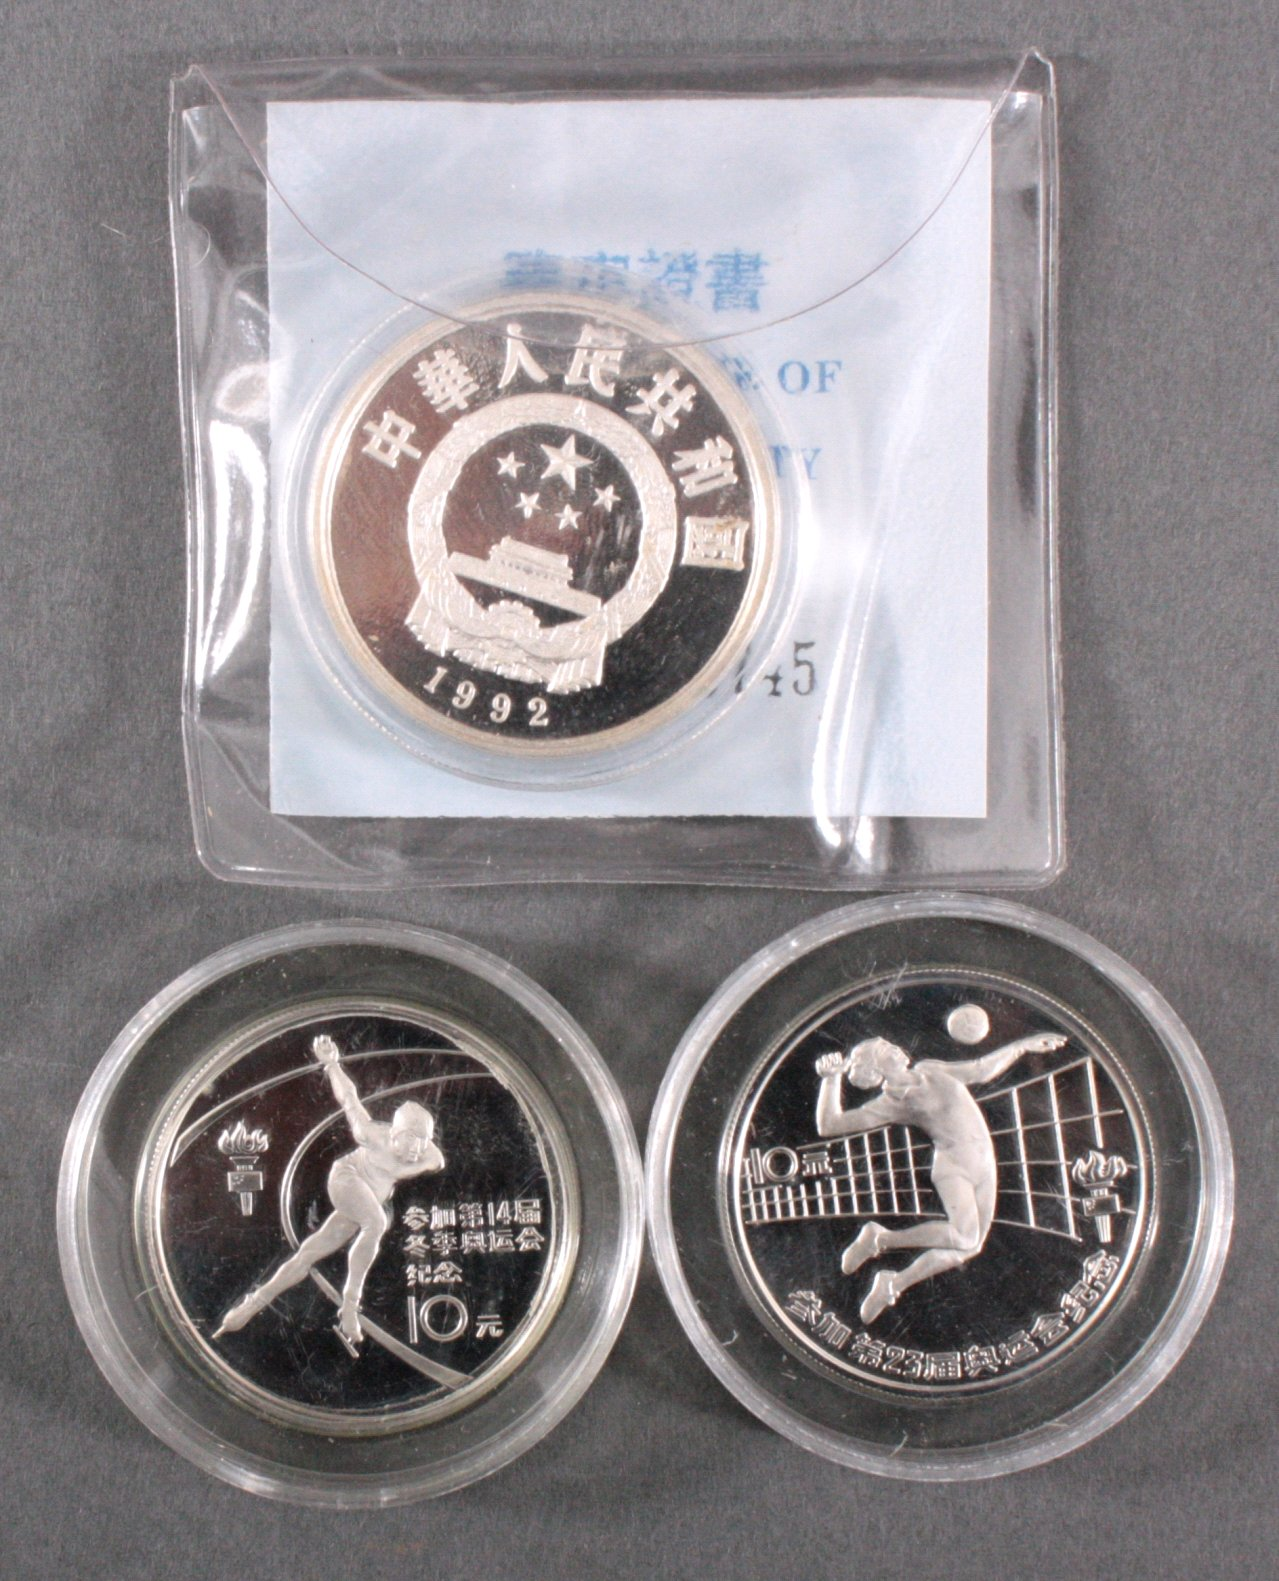 China, 3 Olympiade Silbermünzen, 10 Yuan